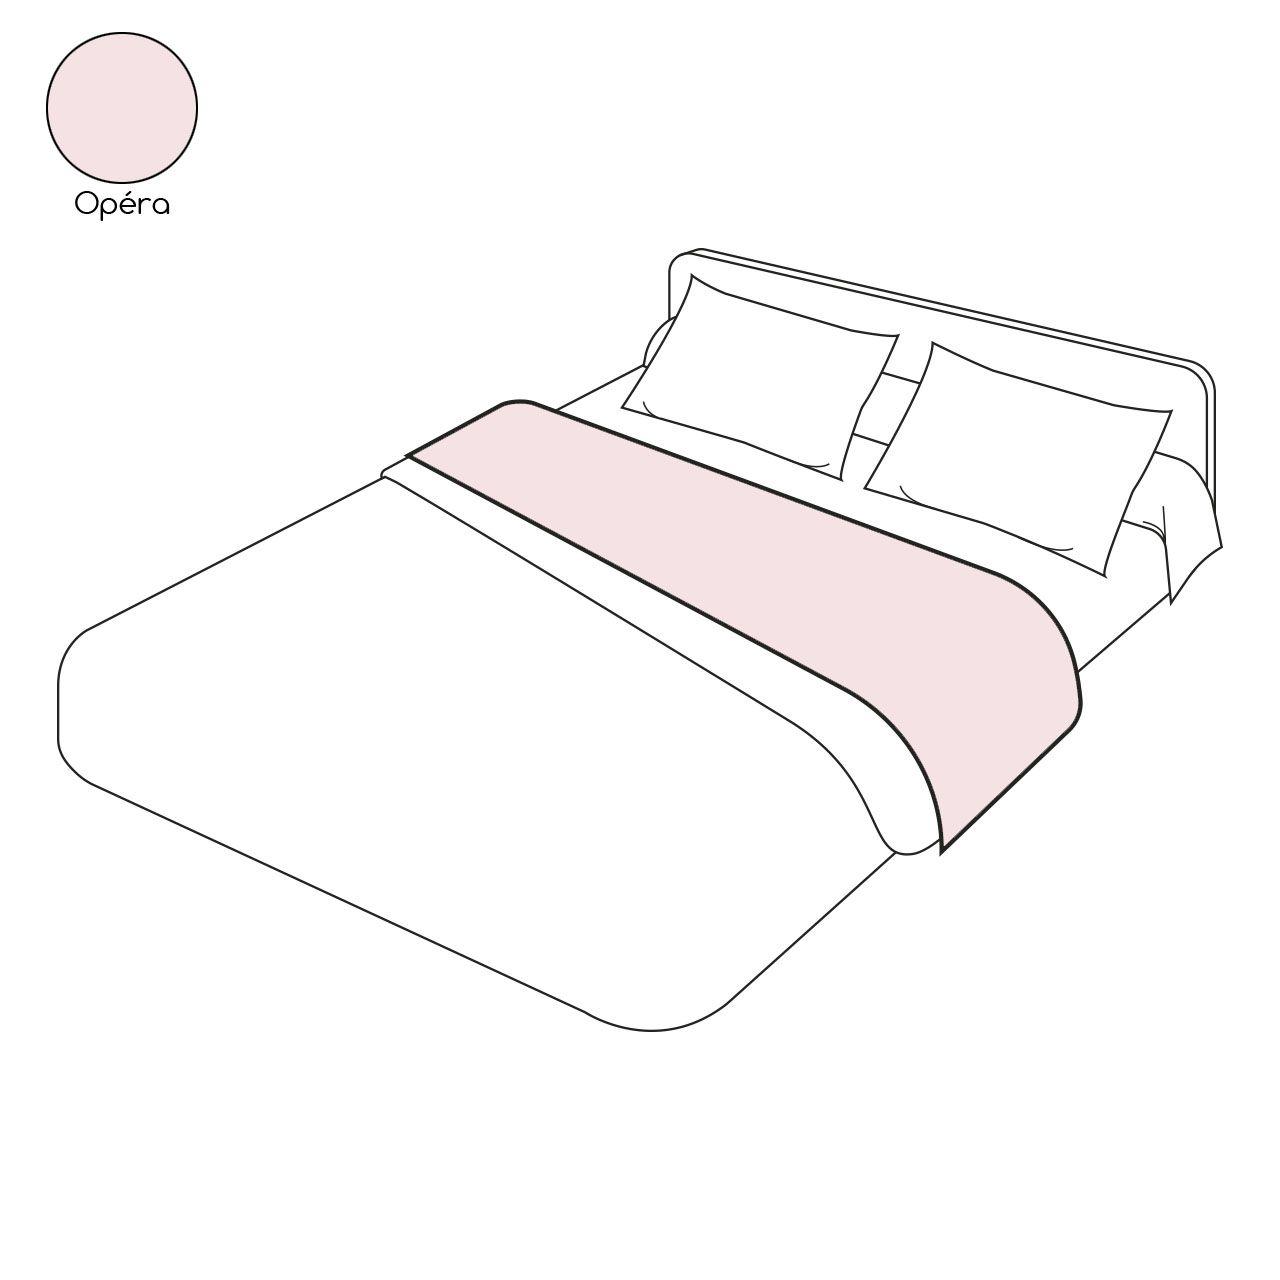 drap plat uni op ra coloris rose pastel percale 270x310. Black Bedroom Furniture Sets. Home Design Ideas